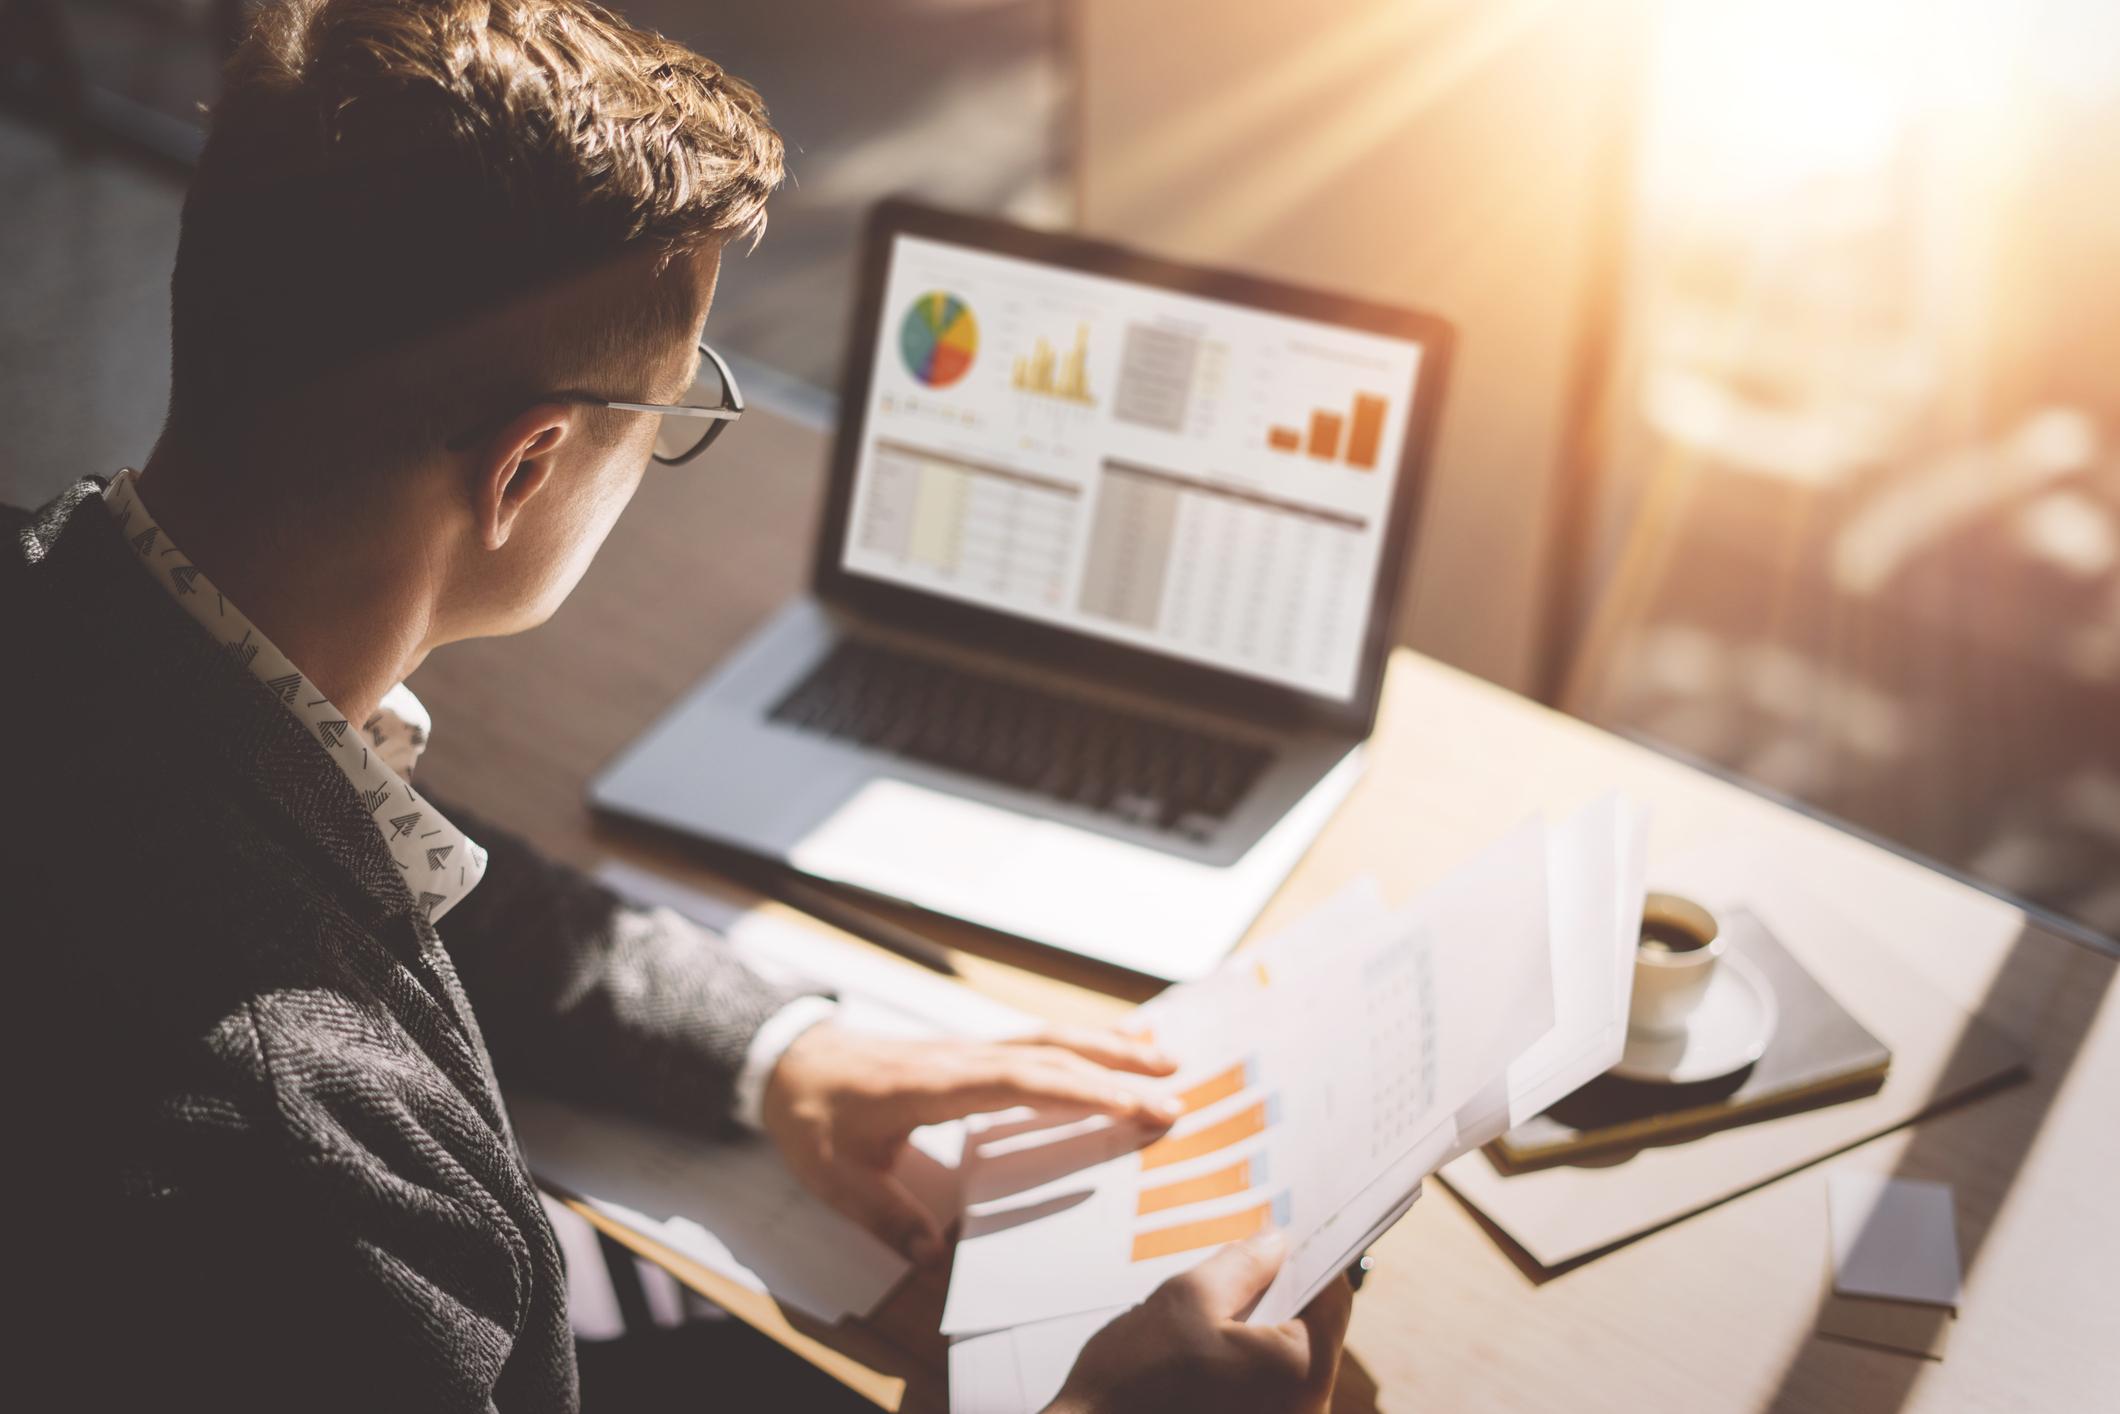 An investor checks his portfolio on a laptop.